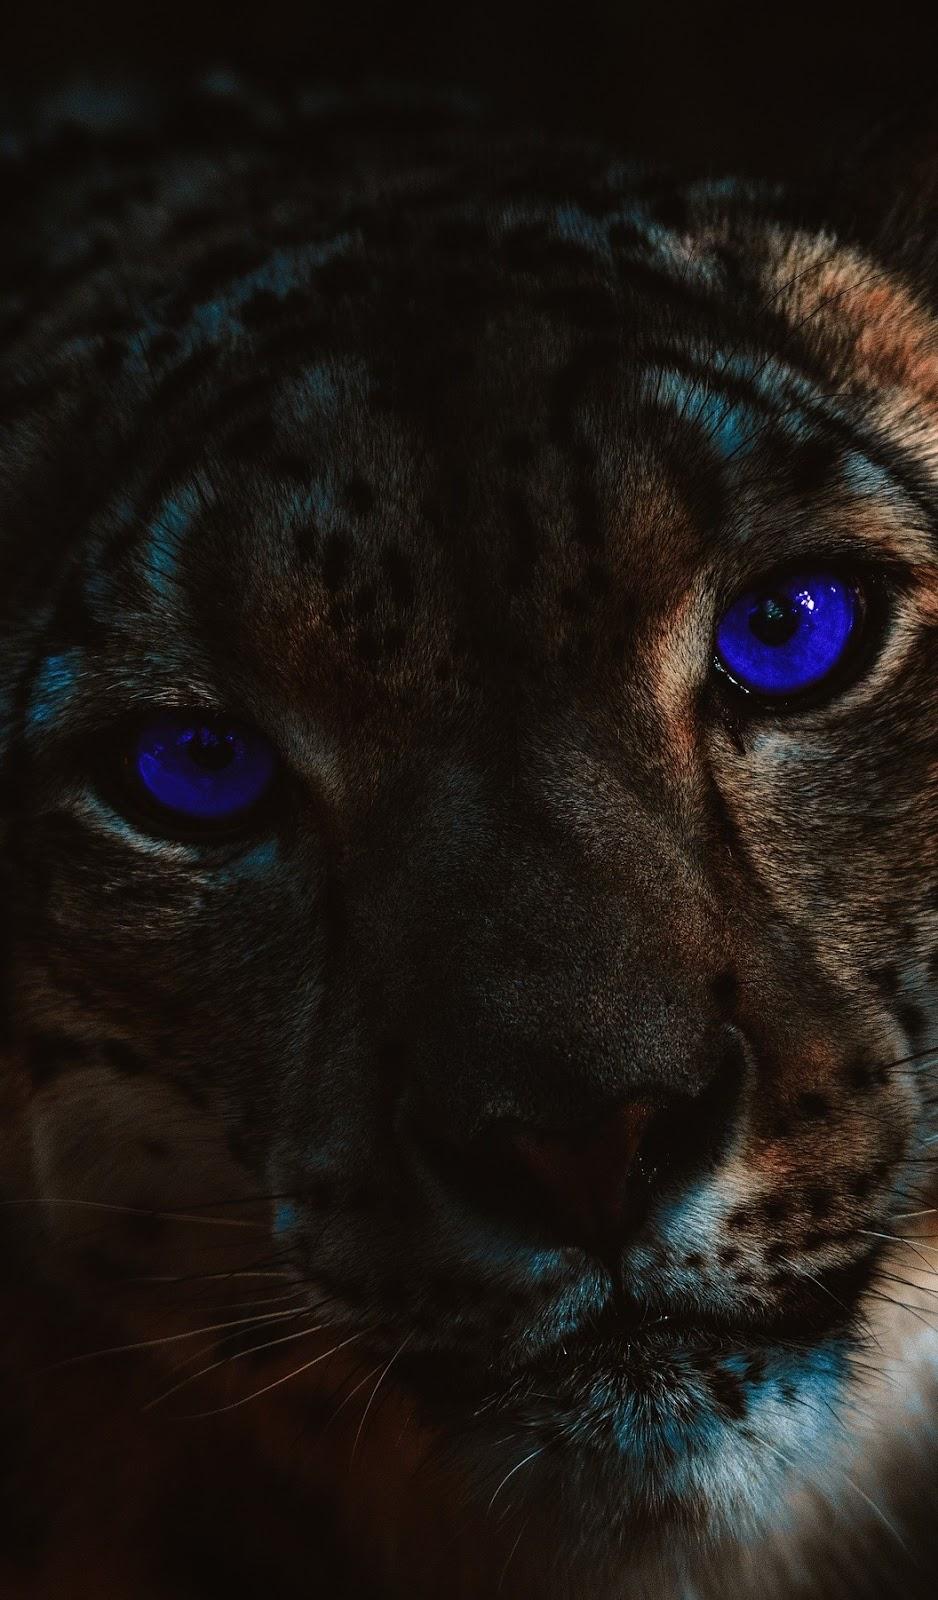 Blue eyed tiger.